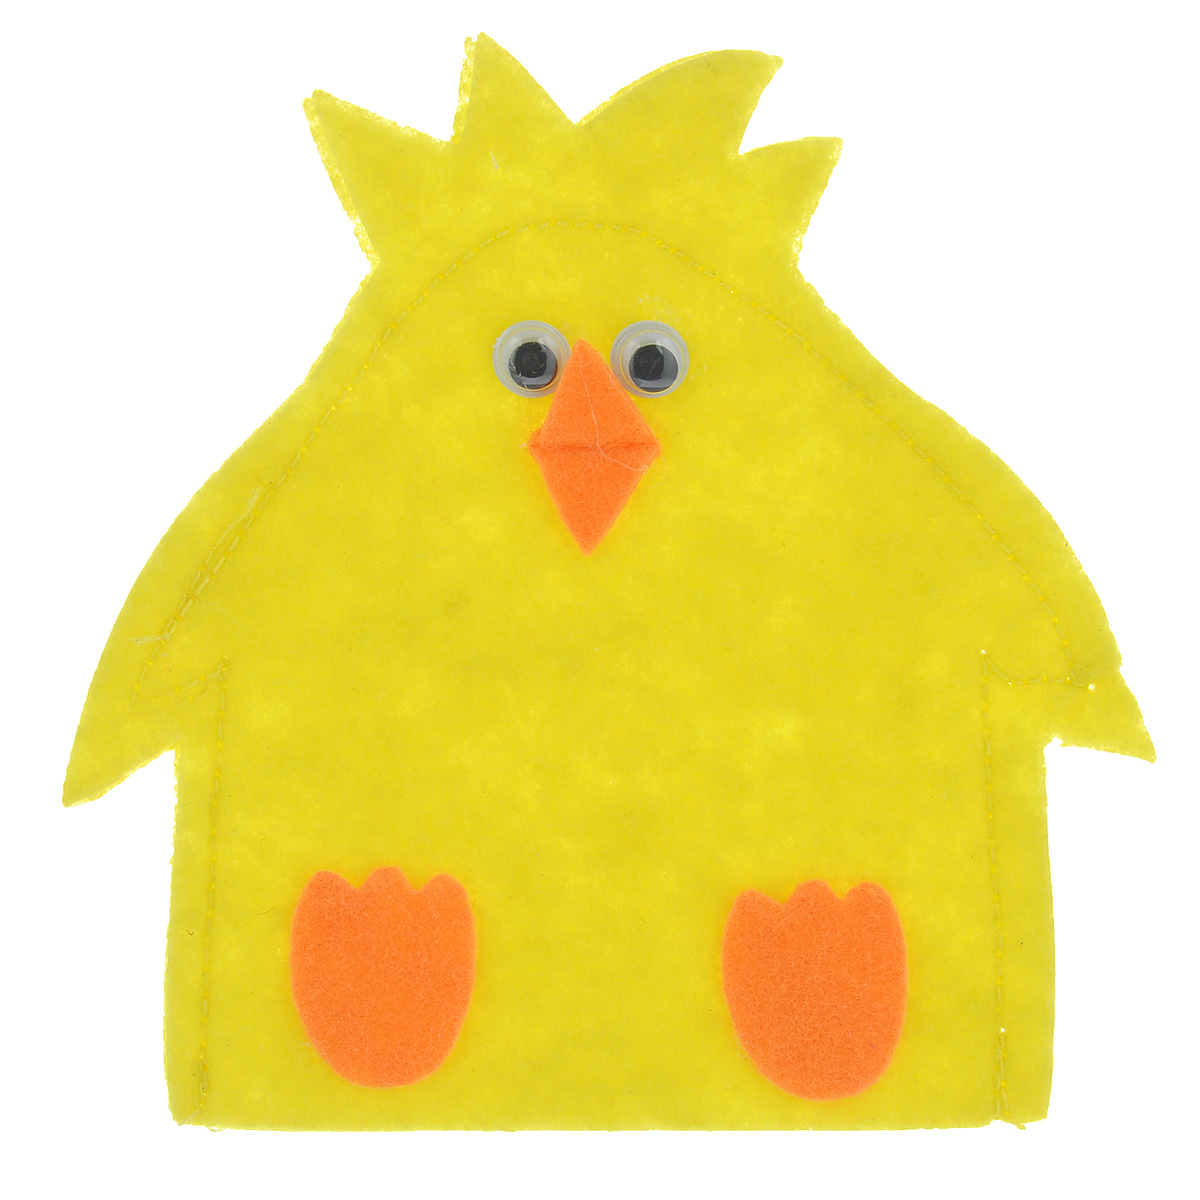 Грелка для яйца Home Queen Цыпленок, цвет: желтый, 11,5 х 11,5 см грелка на чайник курица 39 х 34 х 3 см